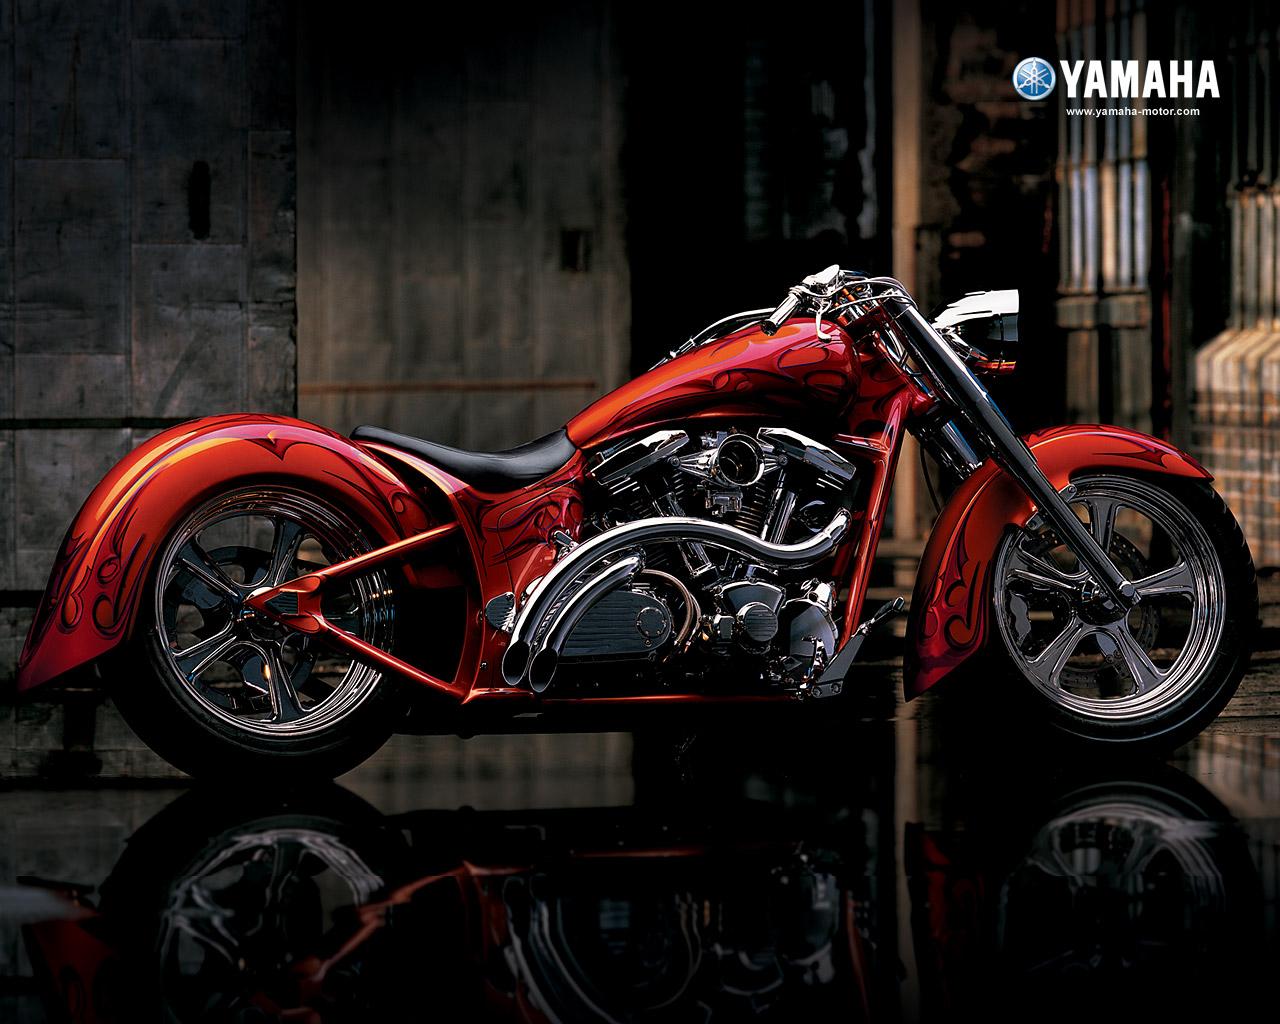 Motorcycle Wallpaper Backgrounds Top Bikes Zone 1280x1024